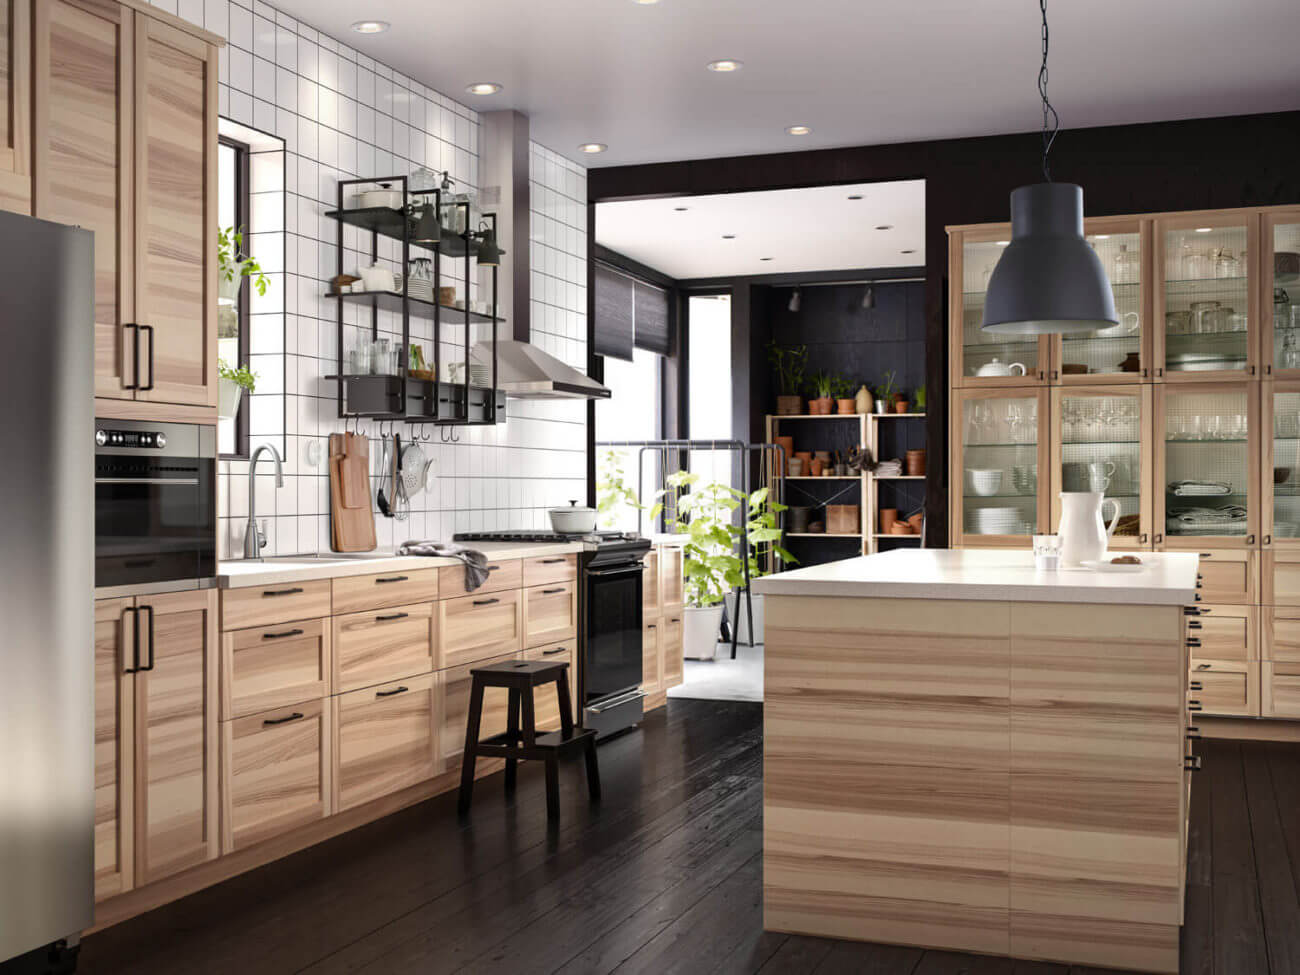 IKEA-Küche in Holzoptik